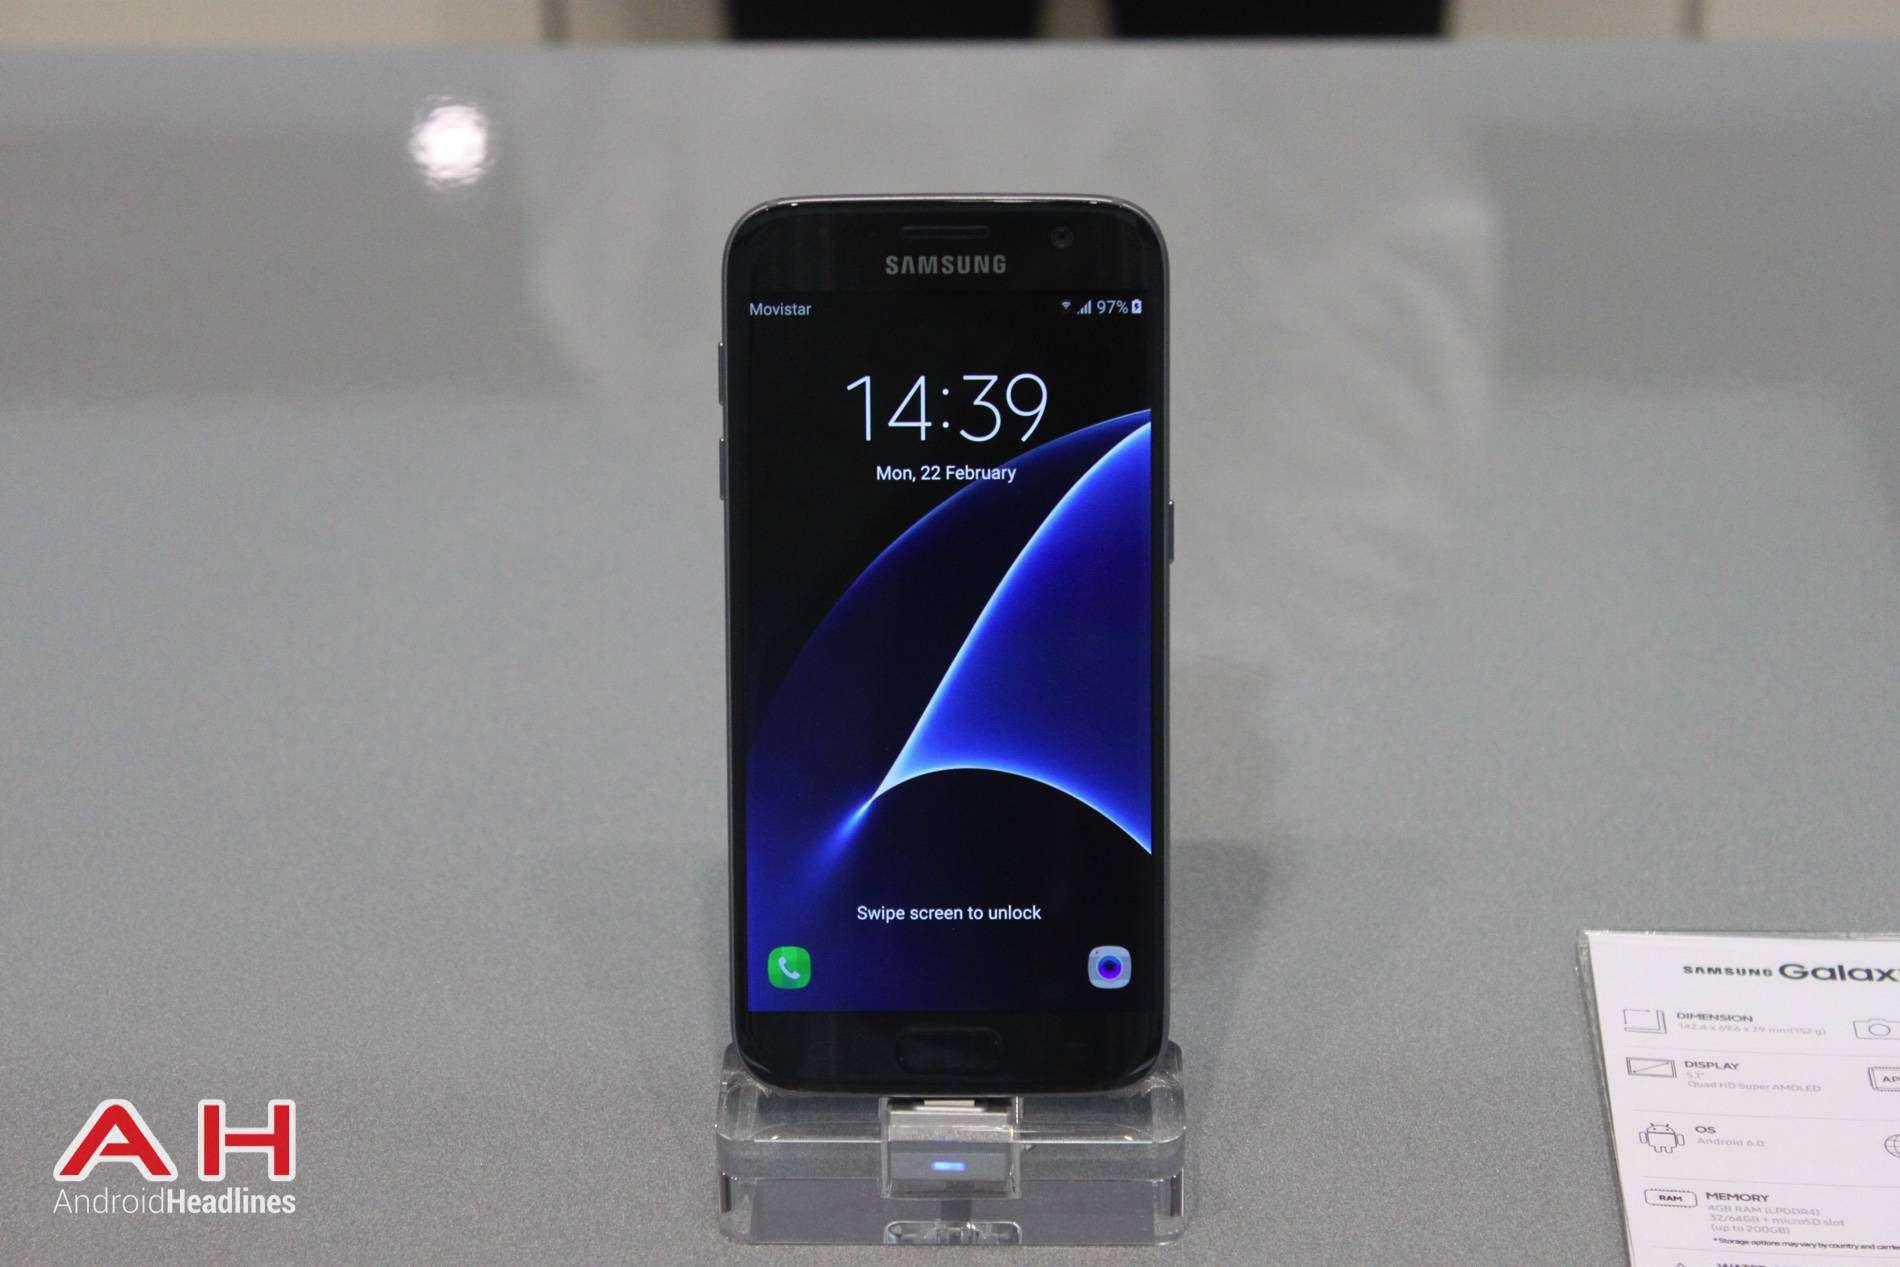 Galaxy S7 MWC Booth AH 8